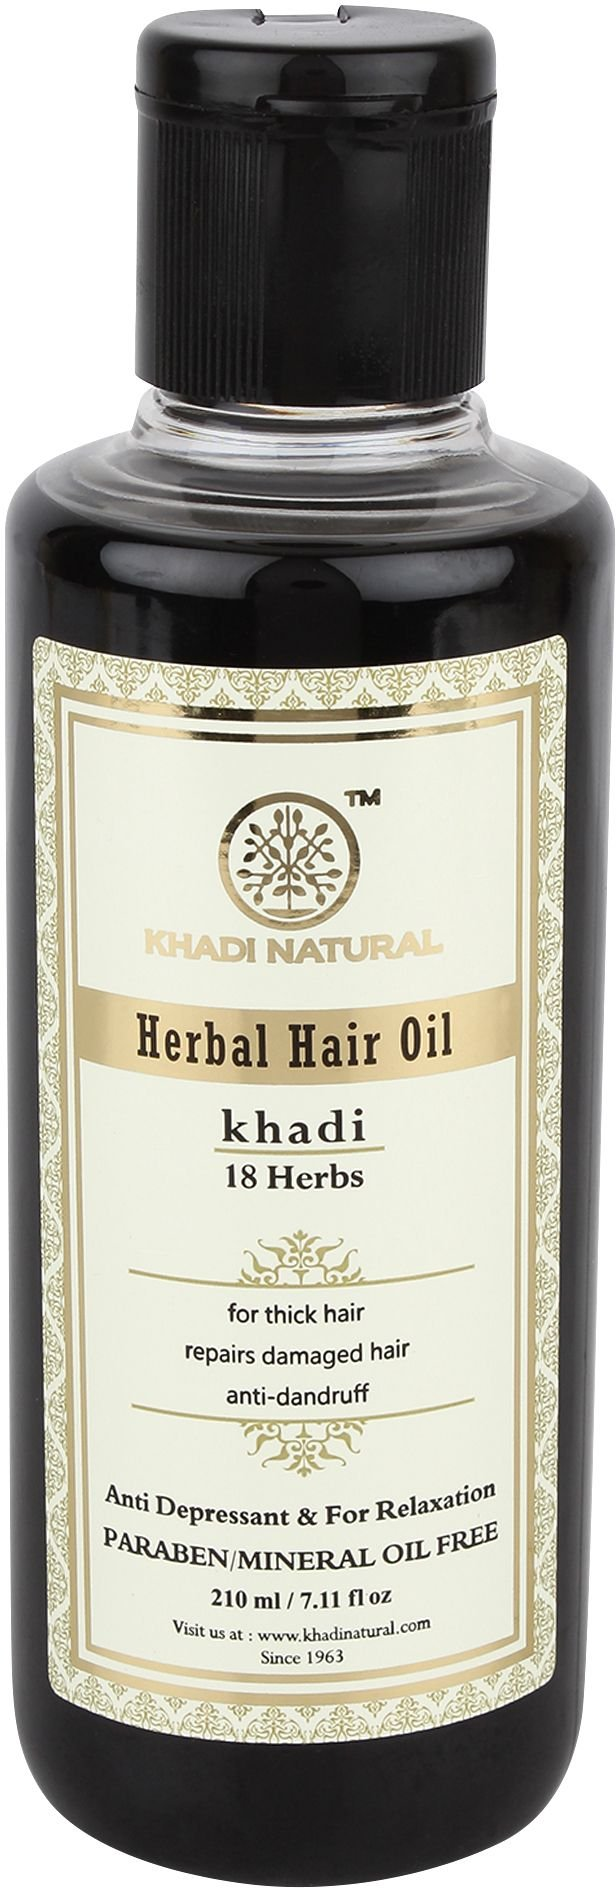 Khadi Natural Ayurvedic Herbal 18 Herbs Hair Oil for Strong Smooth Hair (210 ml)